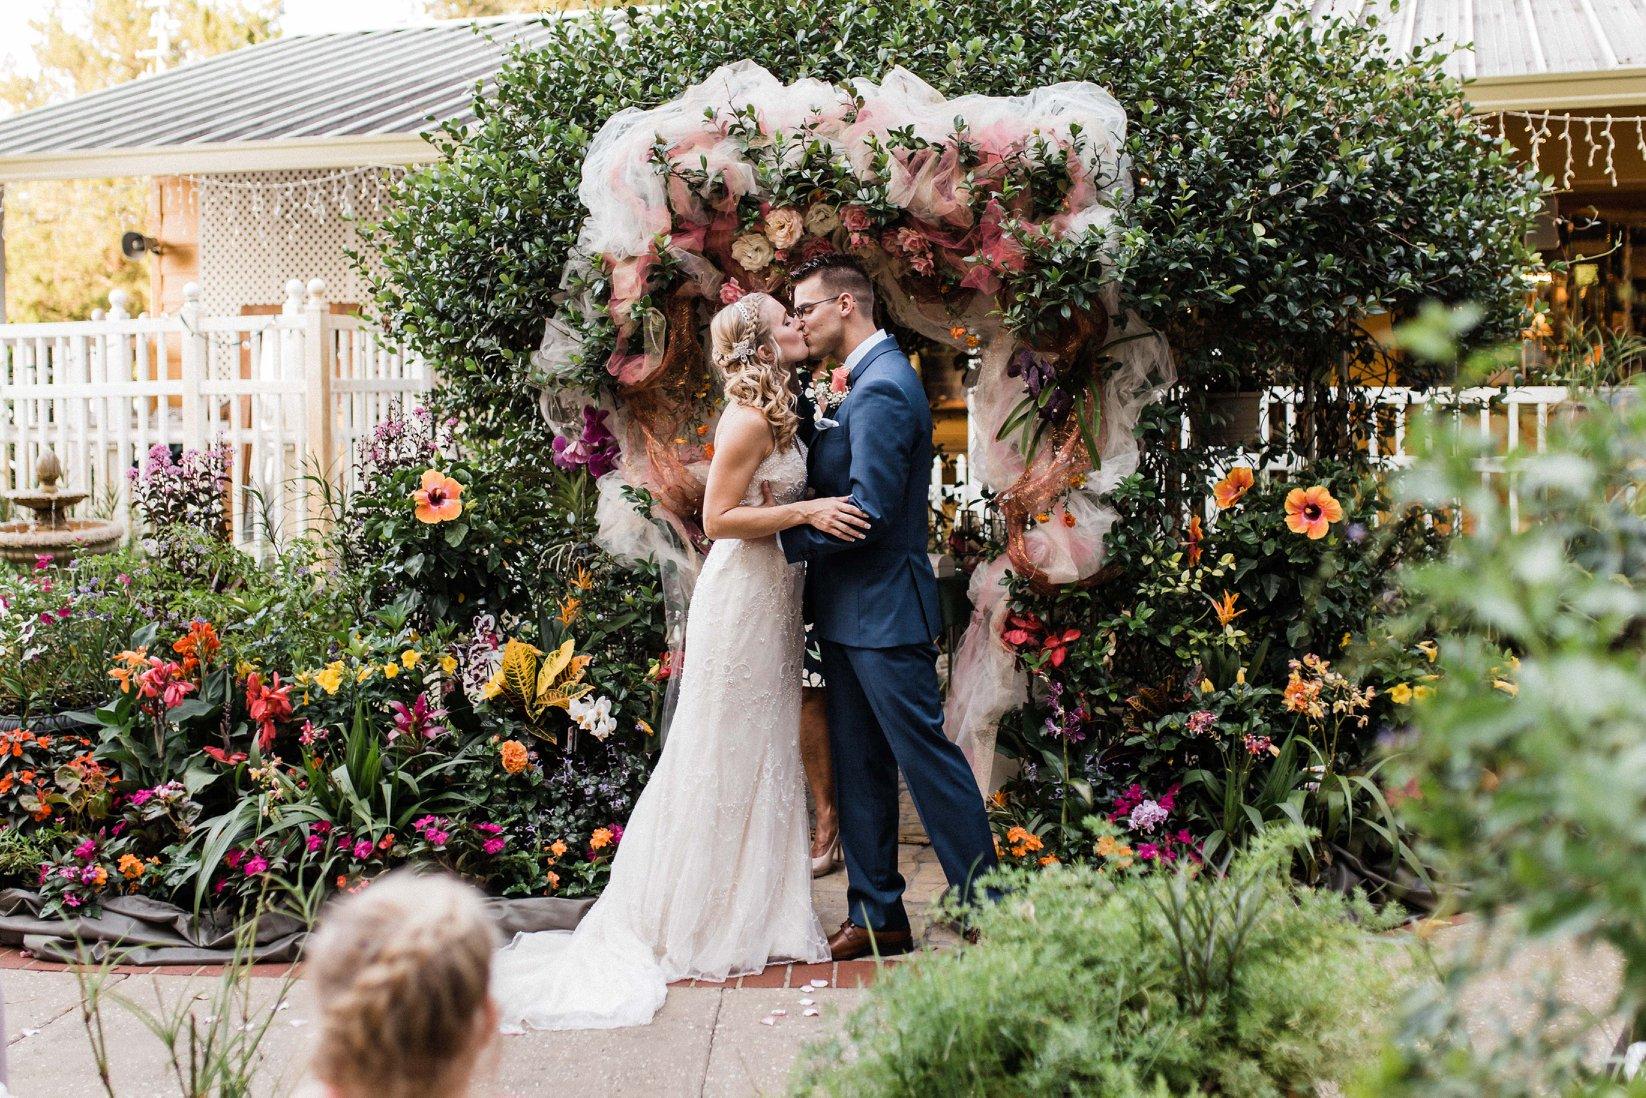 Hanes-wedding-Capricci-garden_gazebo.jpg